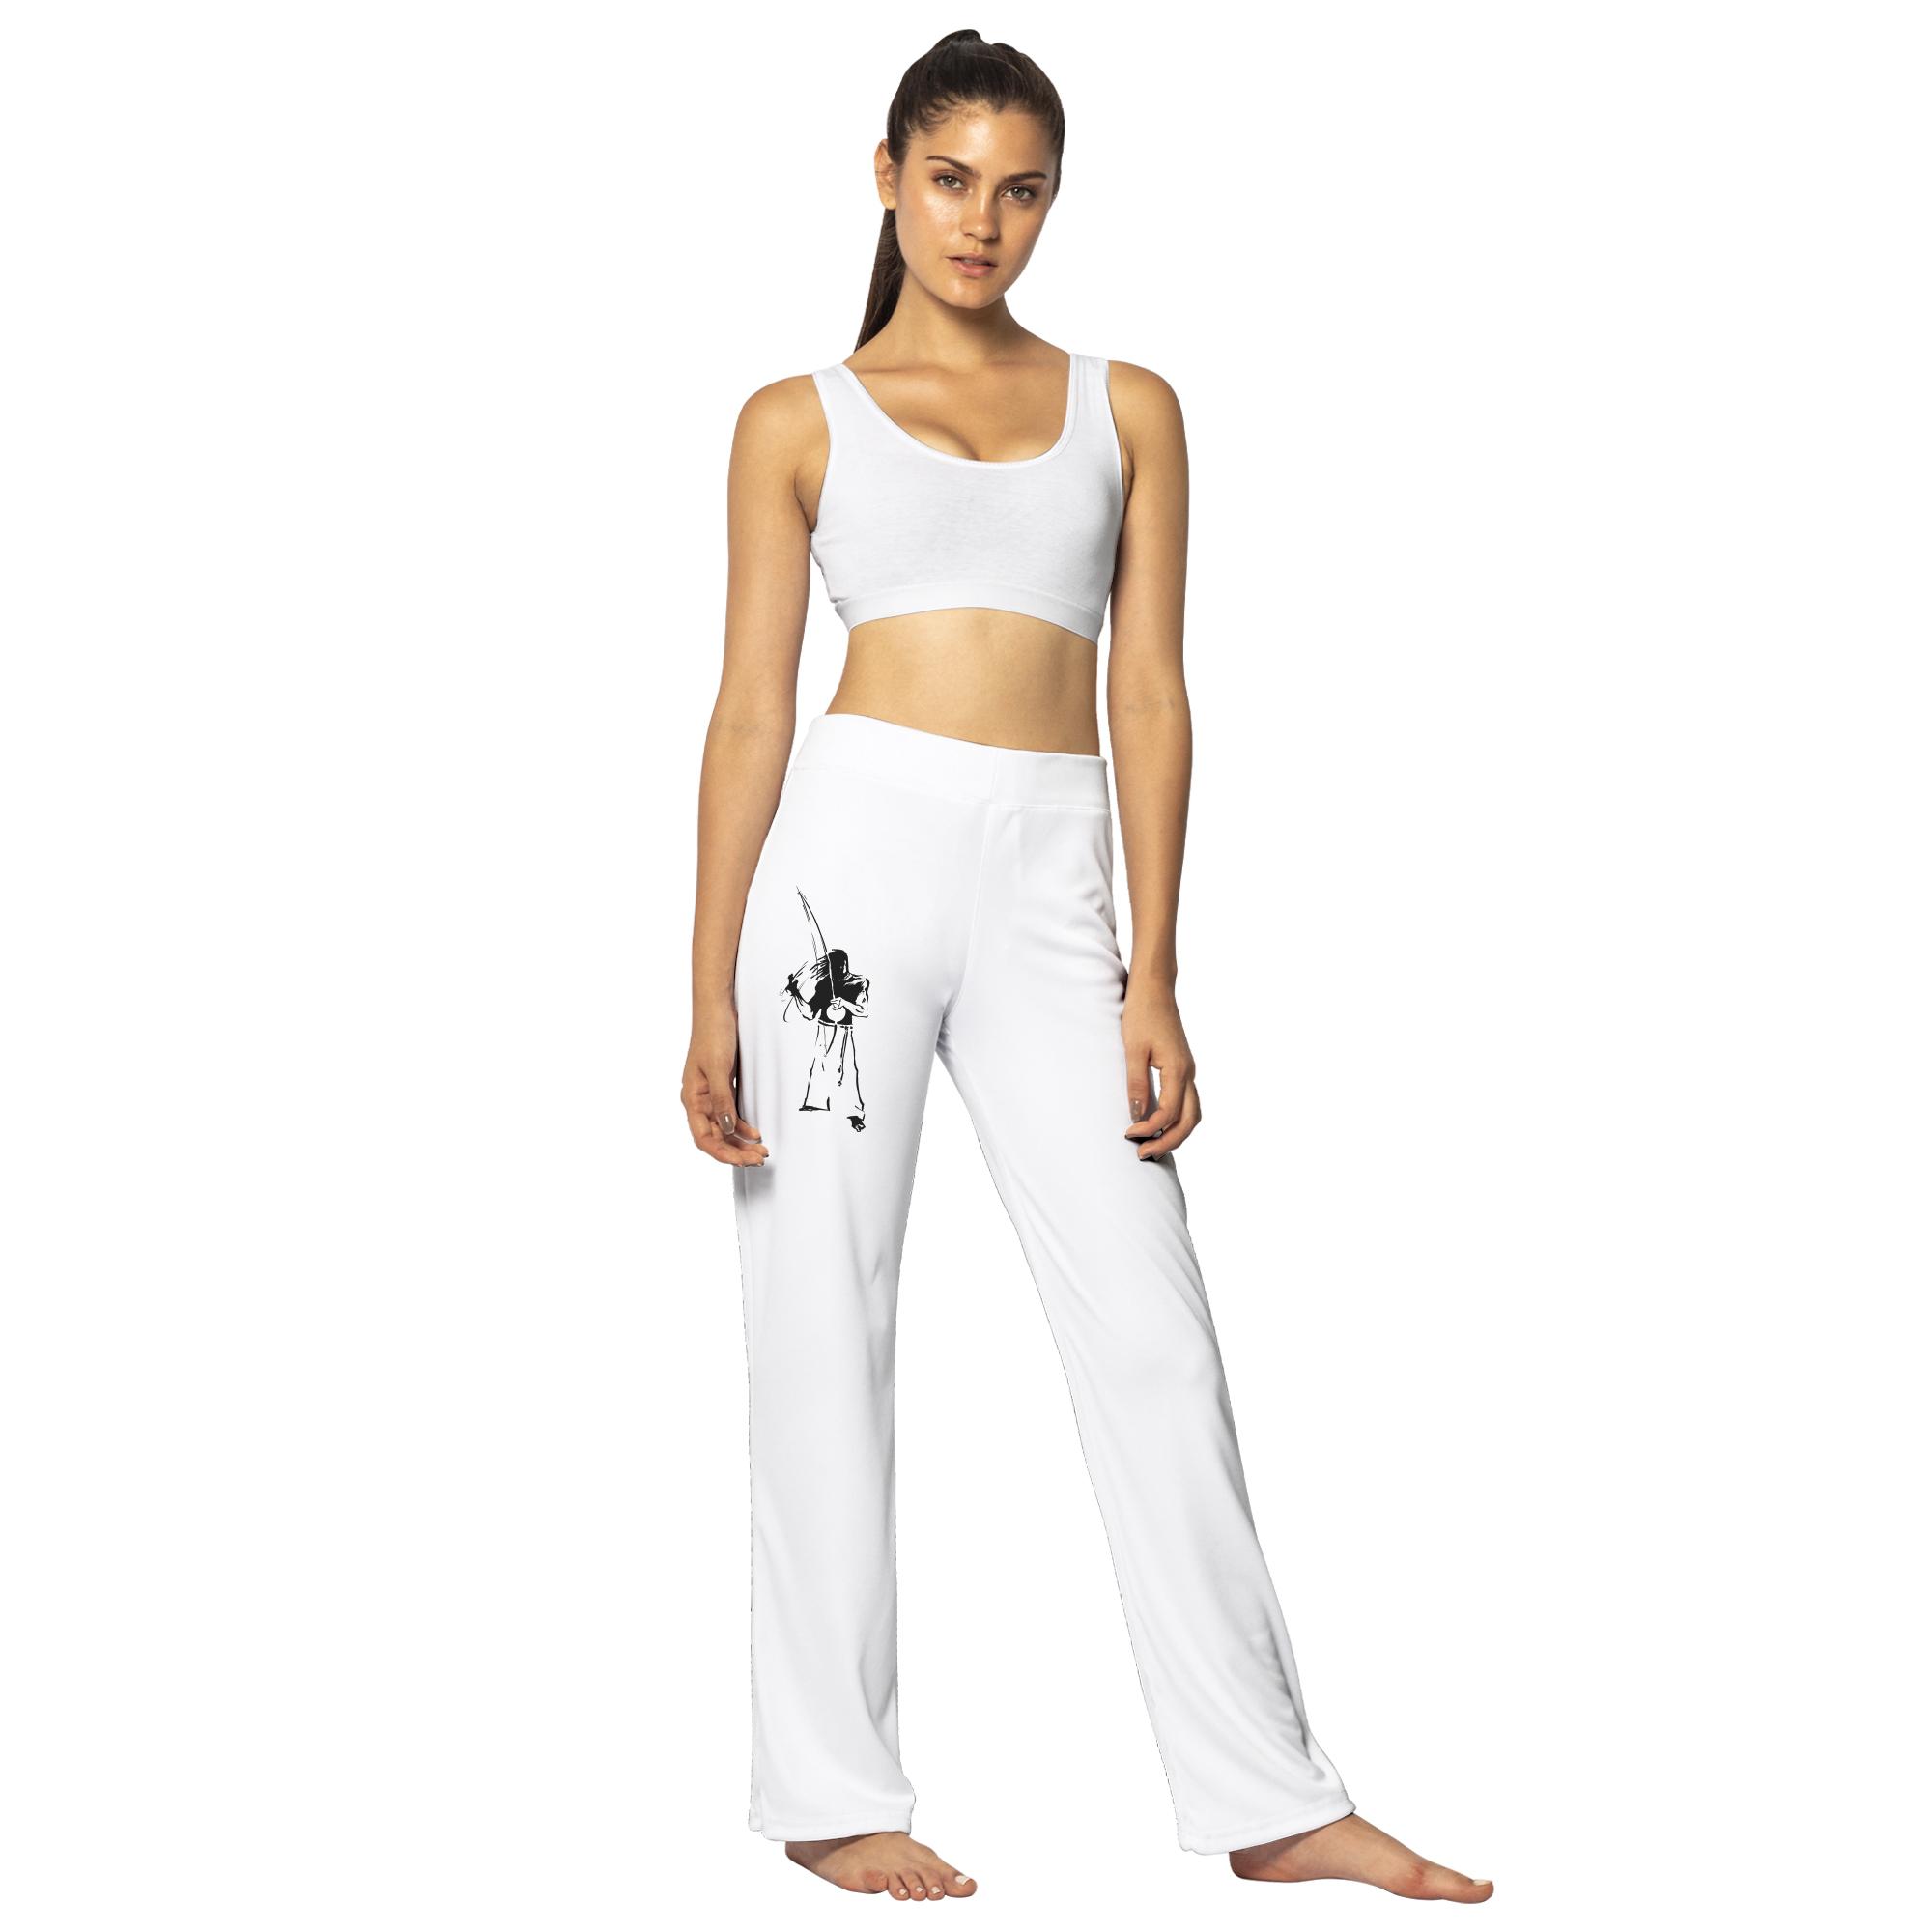 Capoeira pants for women